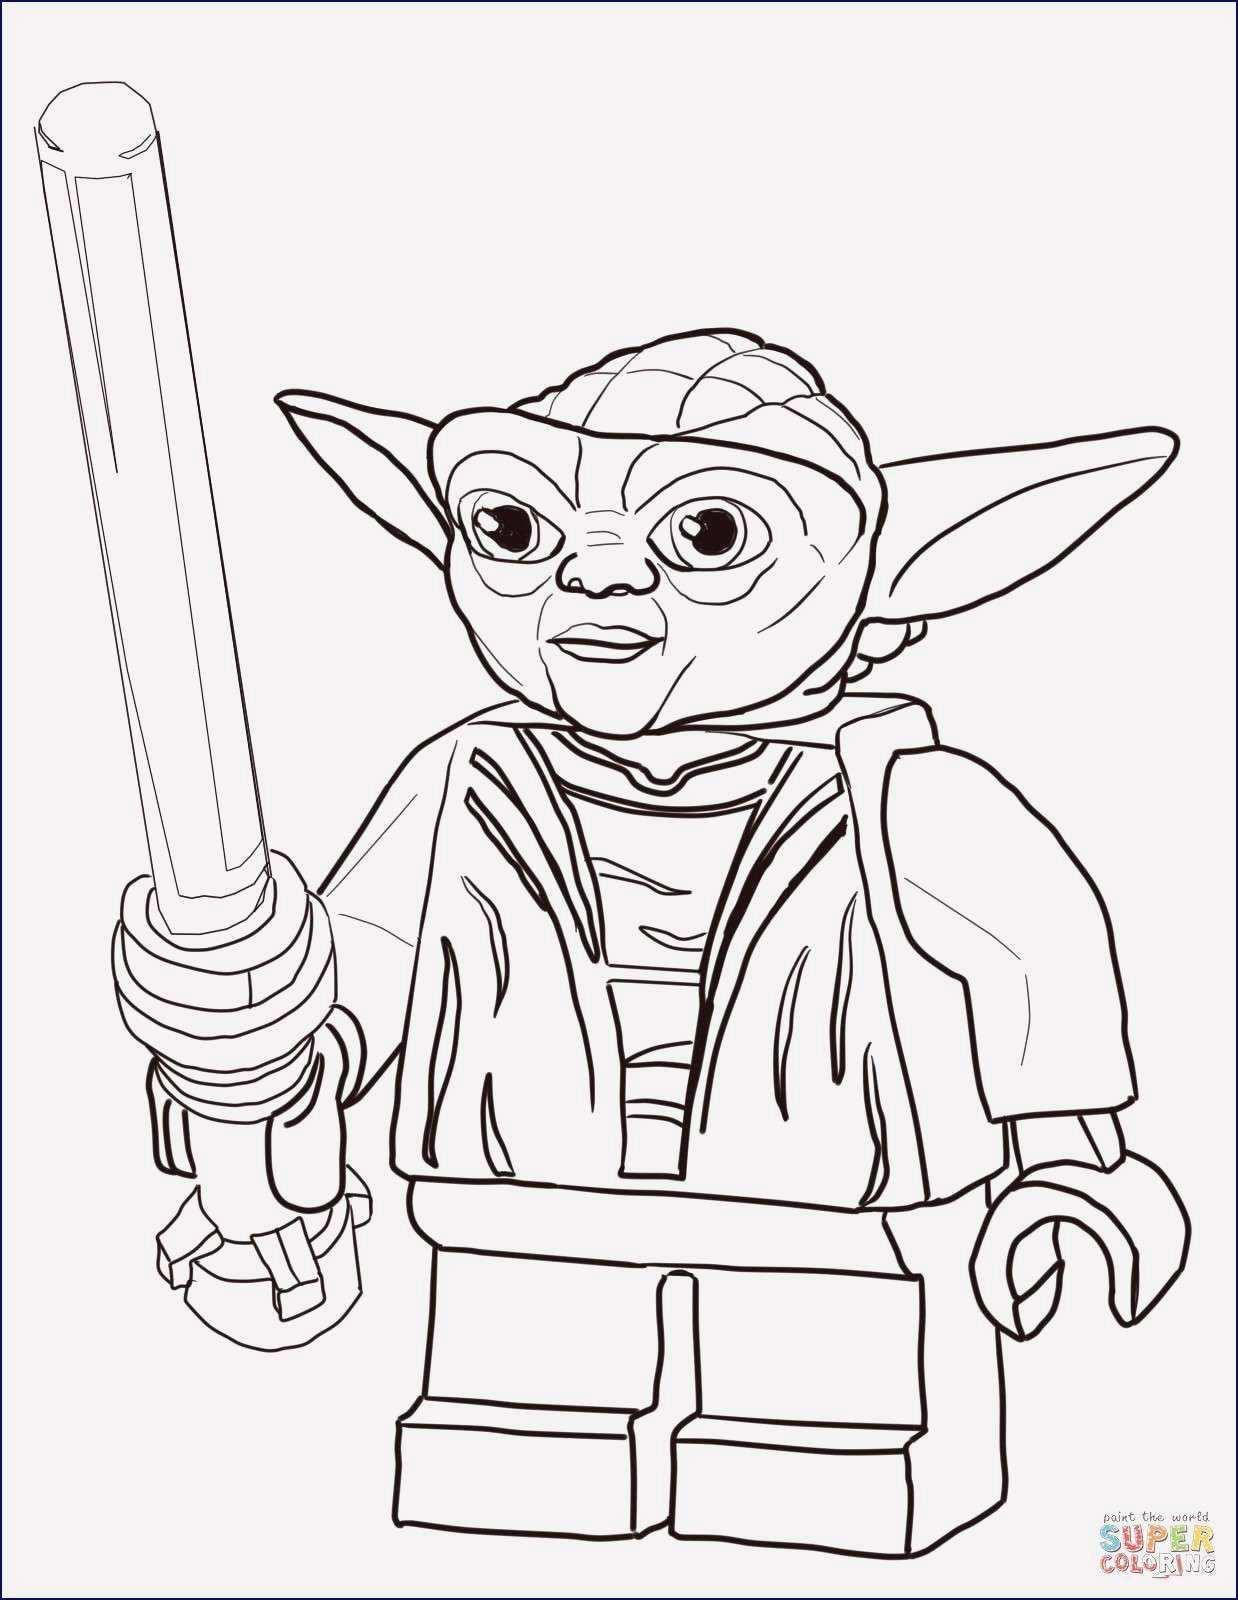 Ausmalbilder Star Wars Einzigartig Yoda Coloring Pages Inspirational Elegant Yoda Coloring Pages Unique Das Bild